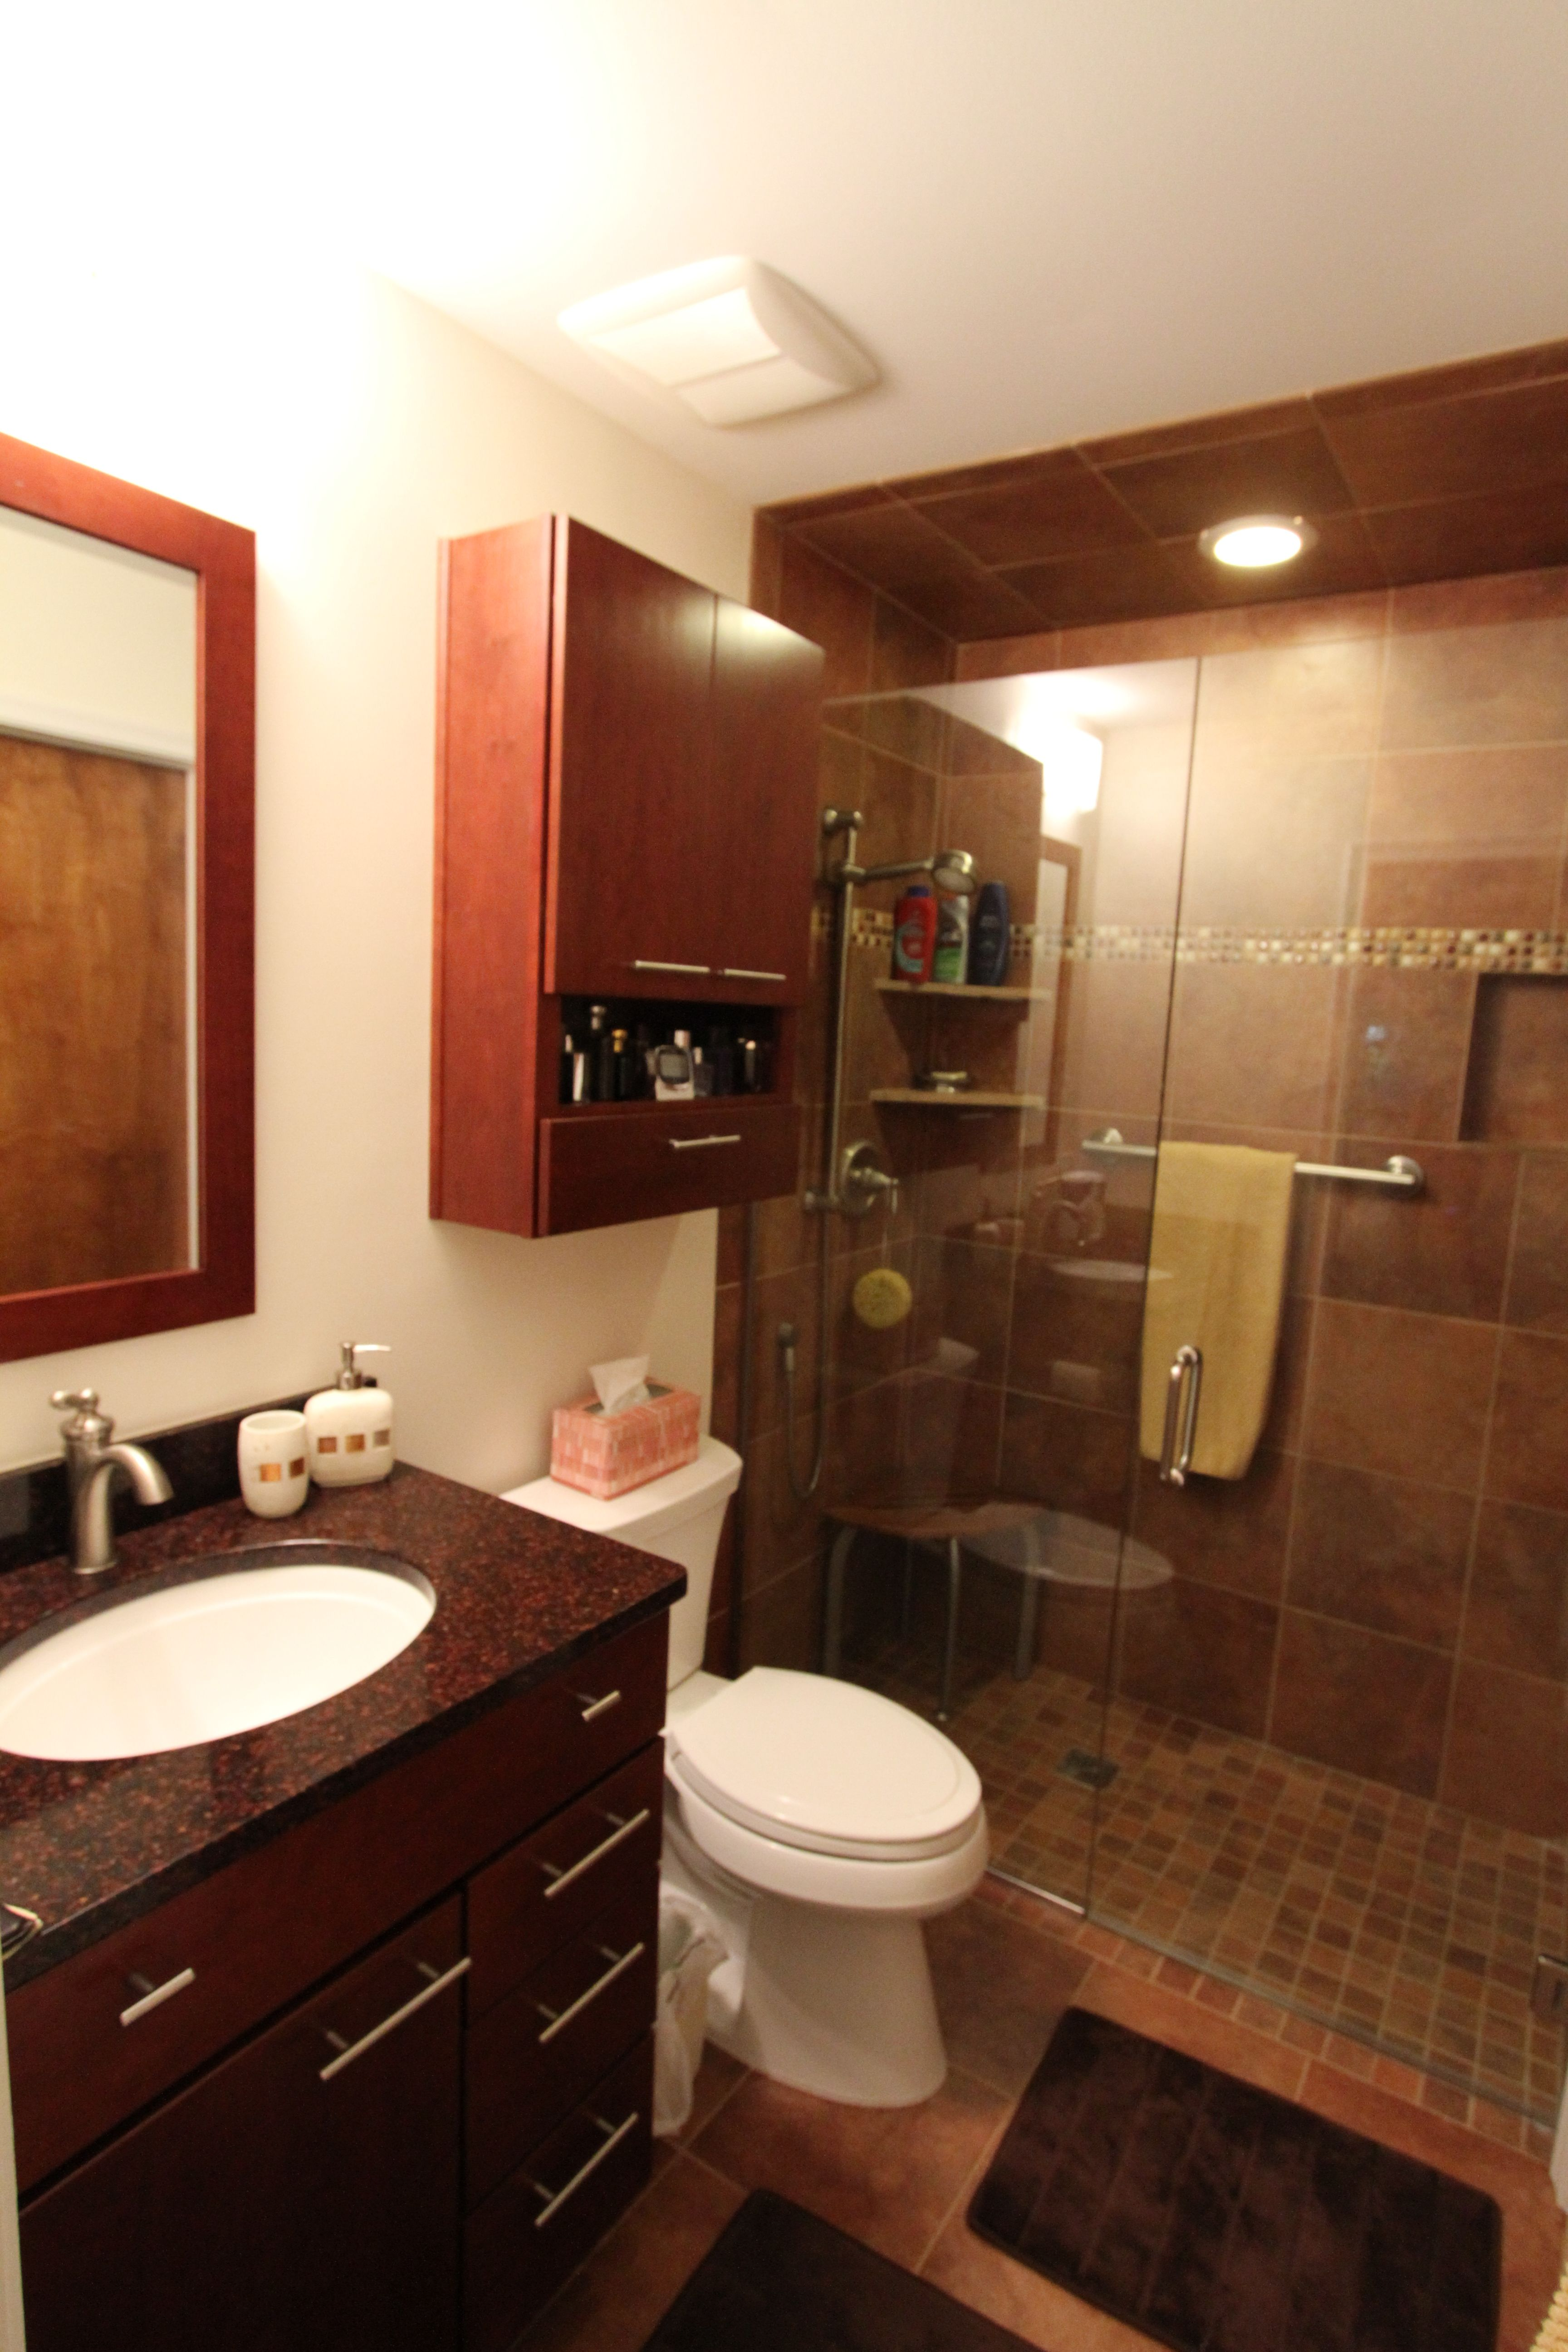 Badezimmer ideen große fliesen small bathroom remodel with wellborn cabinetry u cambria quartz